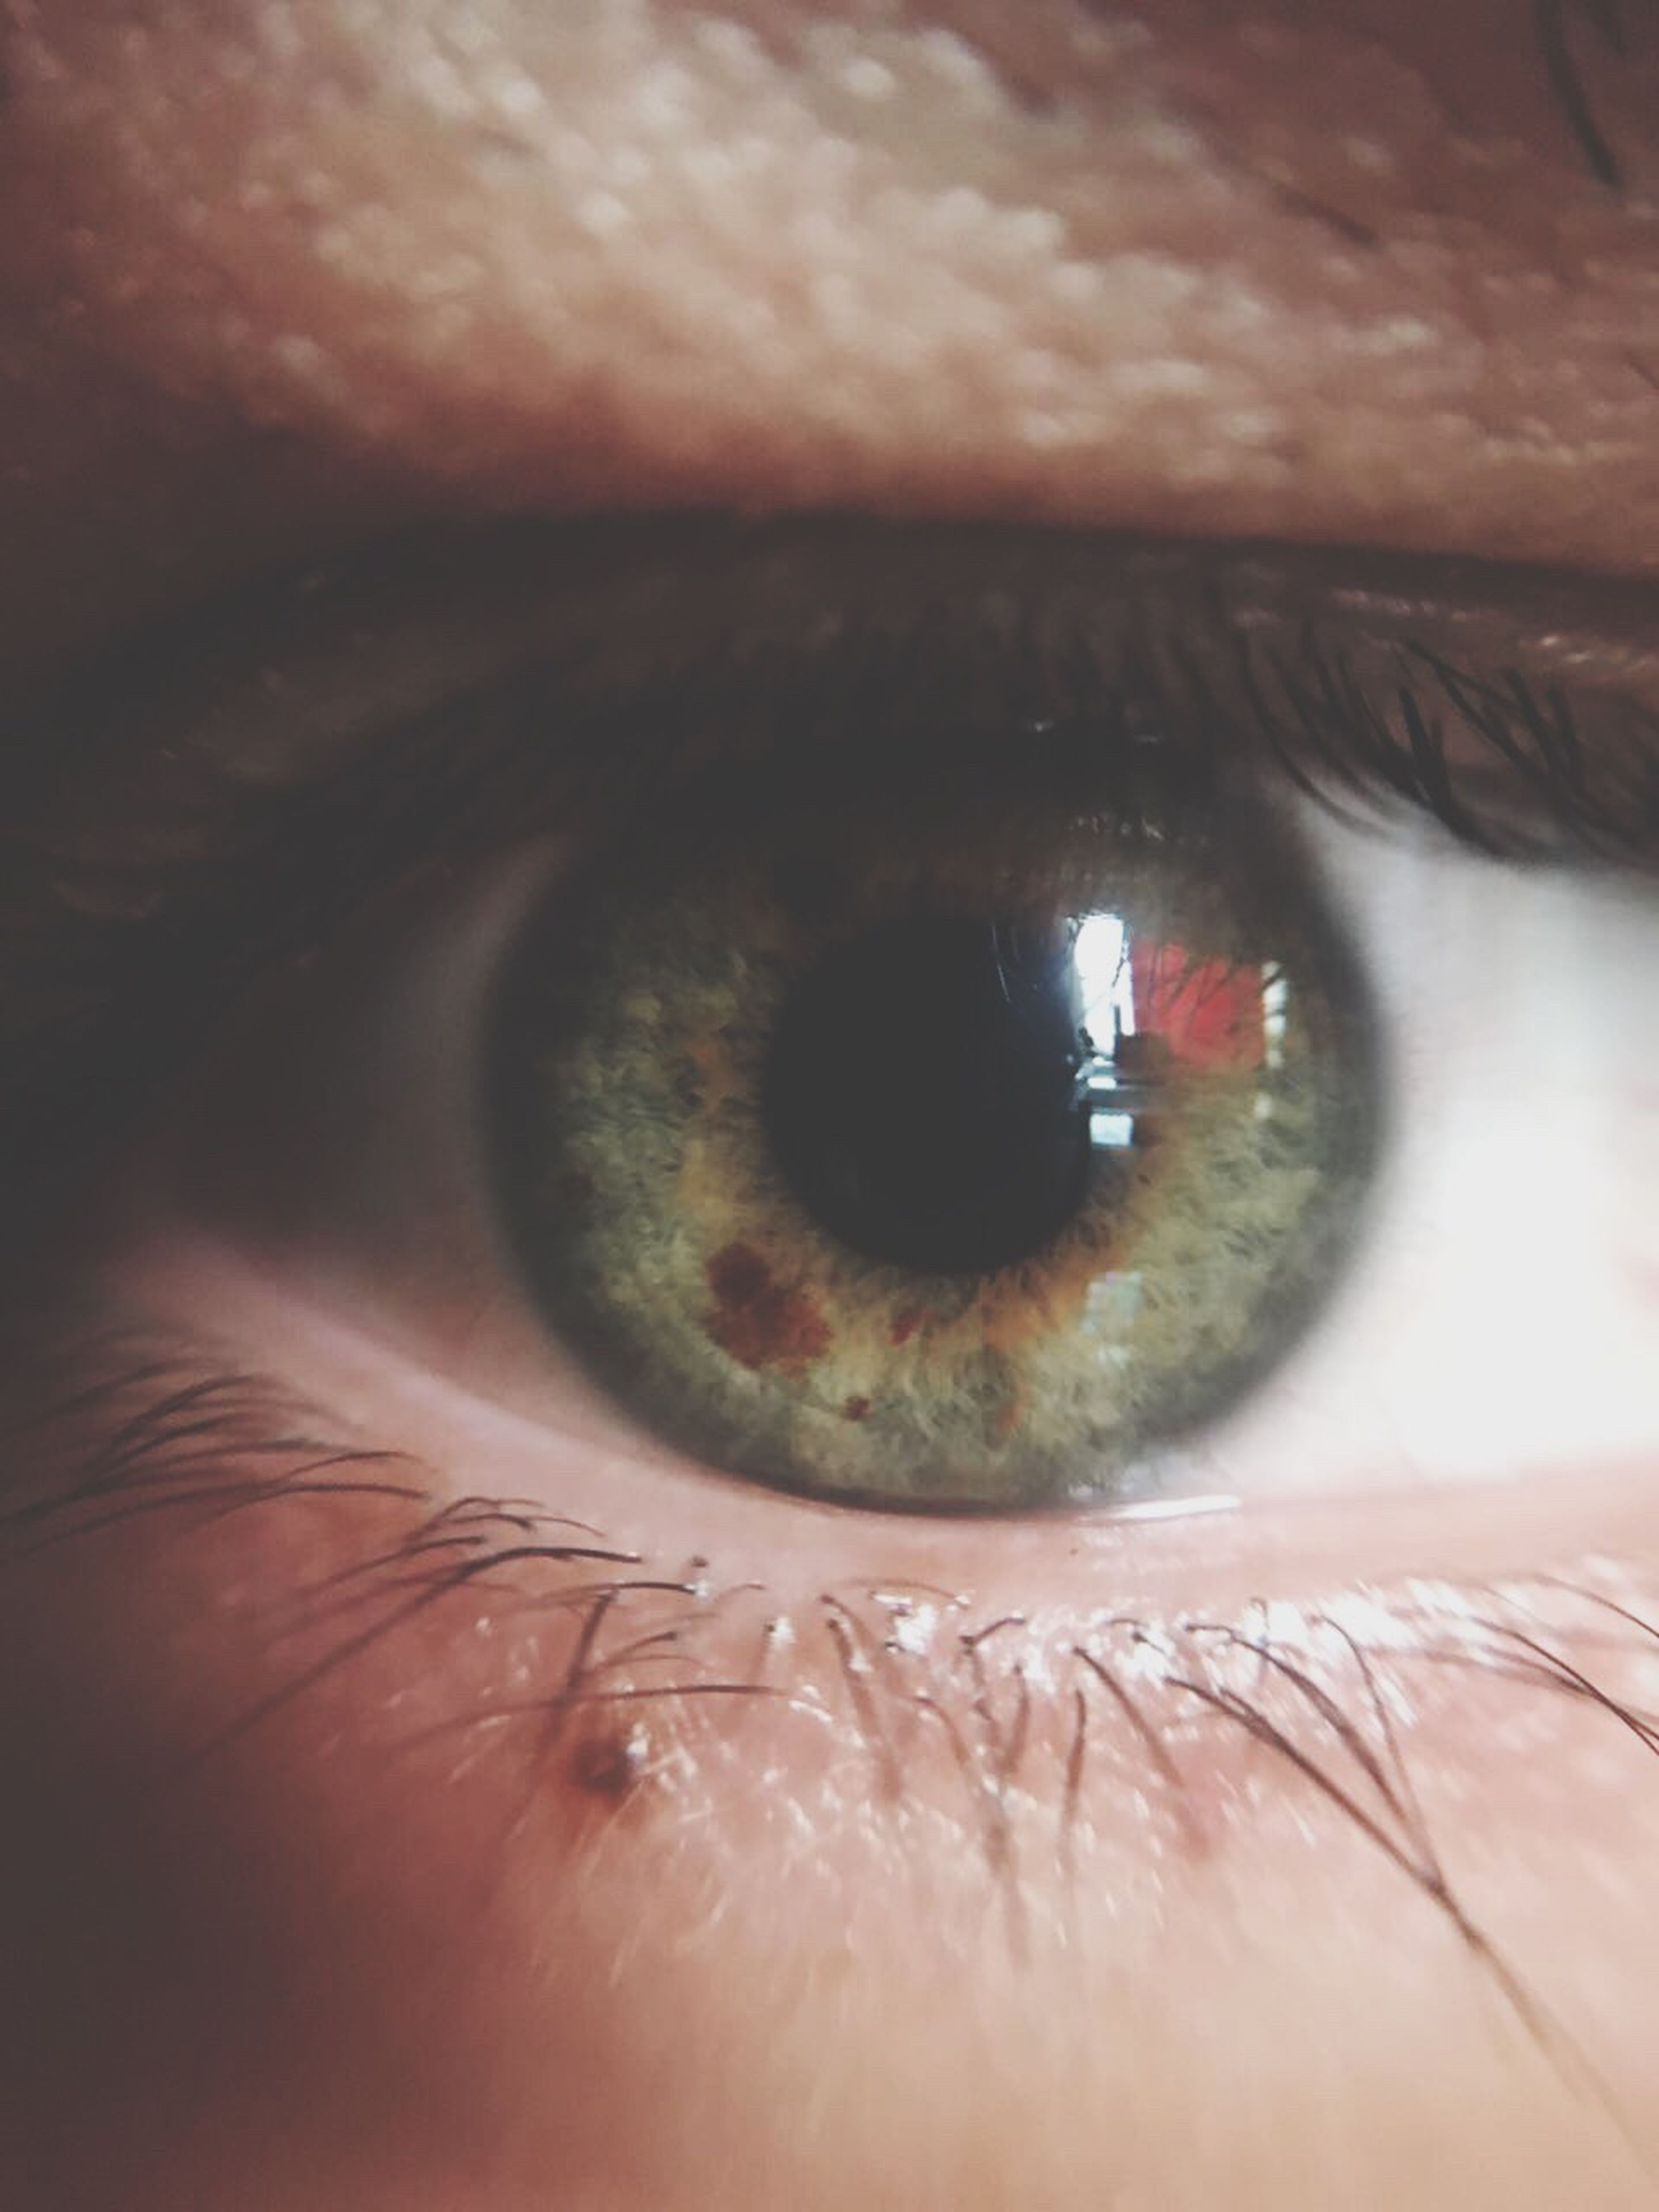 human eye, human body part, eyesight, sensory perception, macro, close-up, real people, eyelash, iris - eye, one person, eyeball, portrait, backgrounds, indoors, vision, people, day, adult